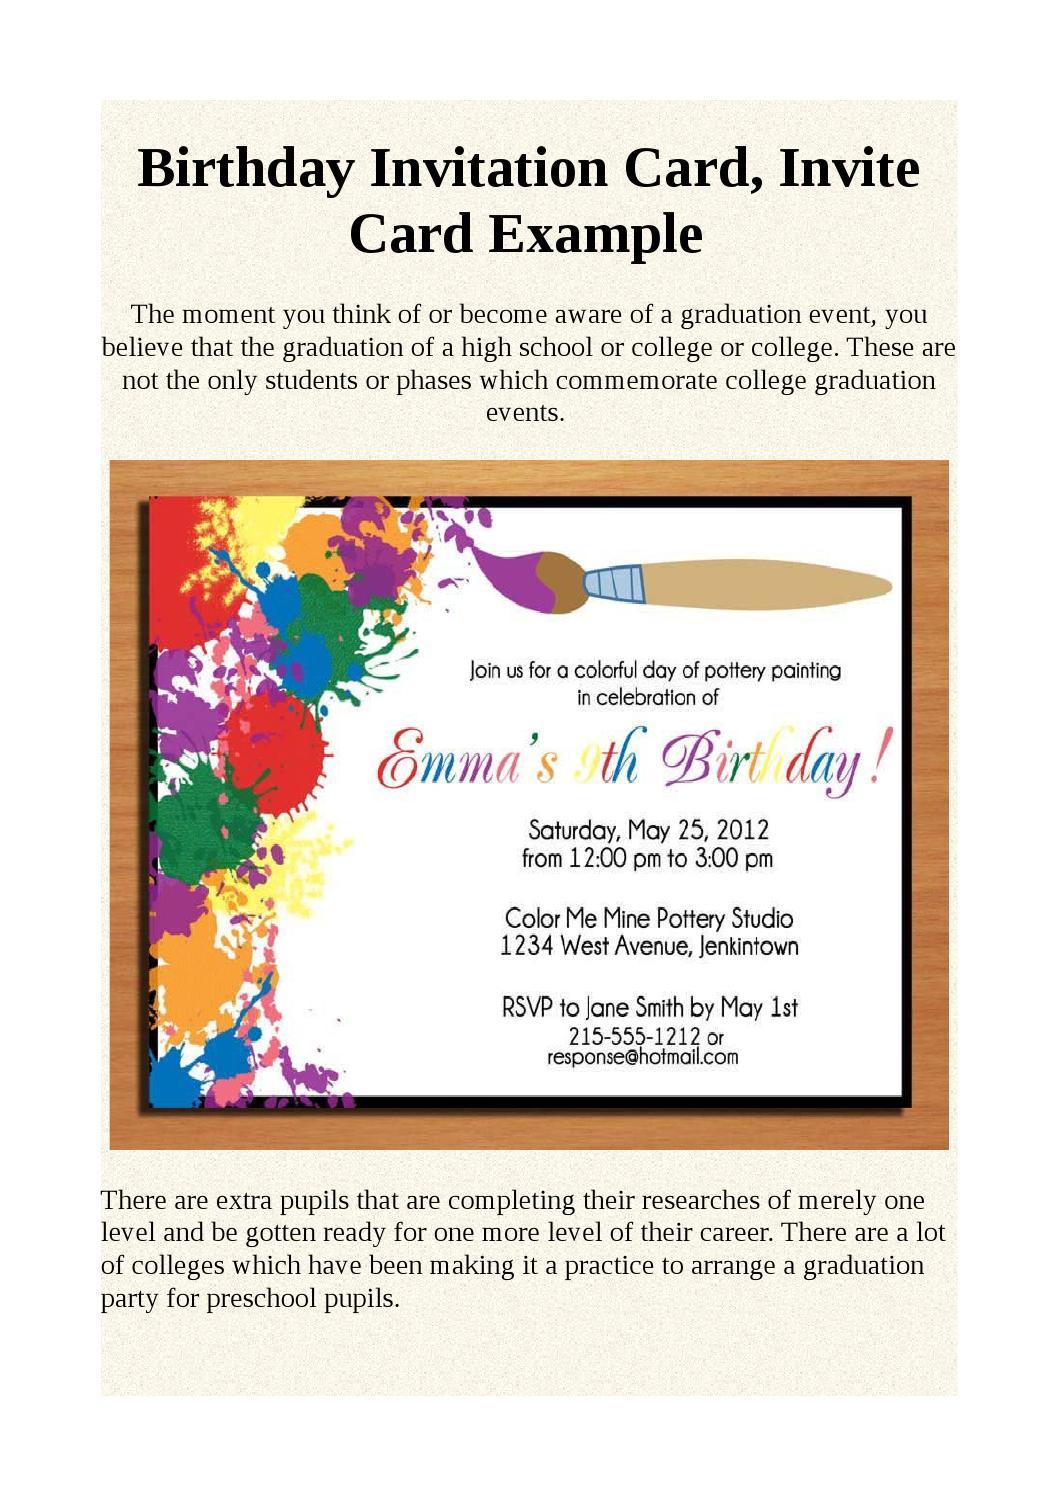 birthday invitation card invite card